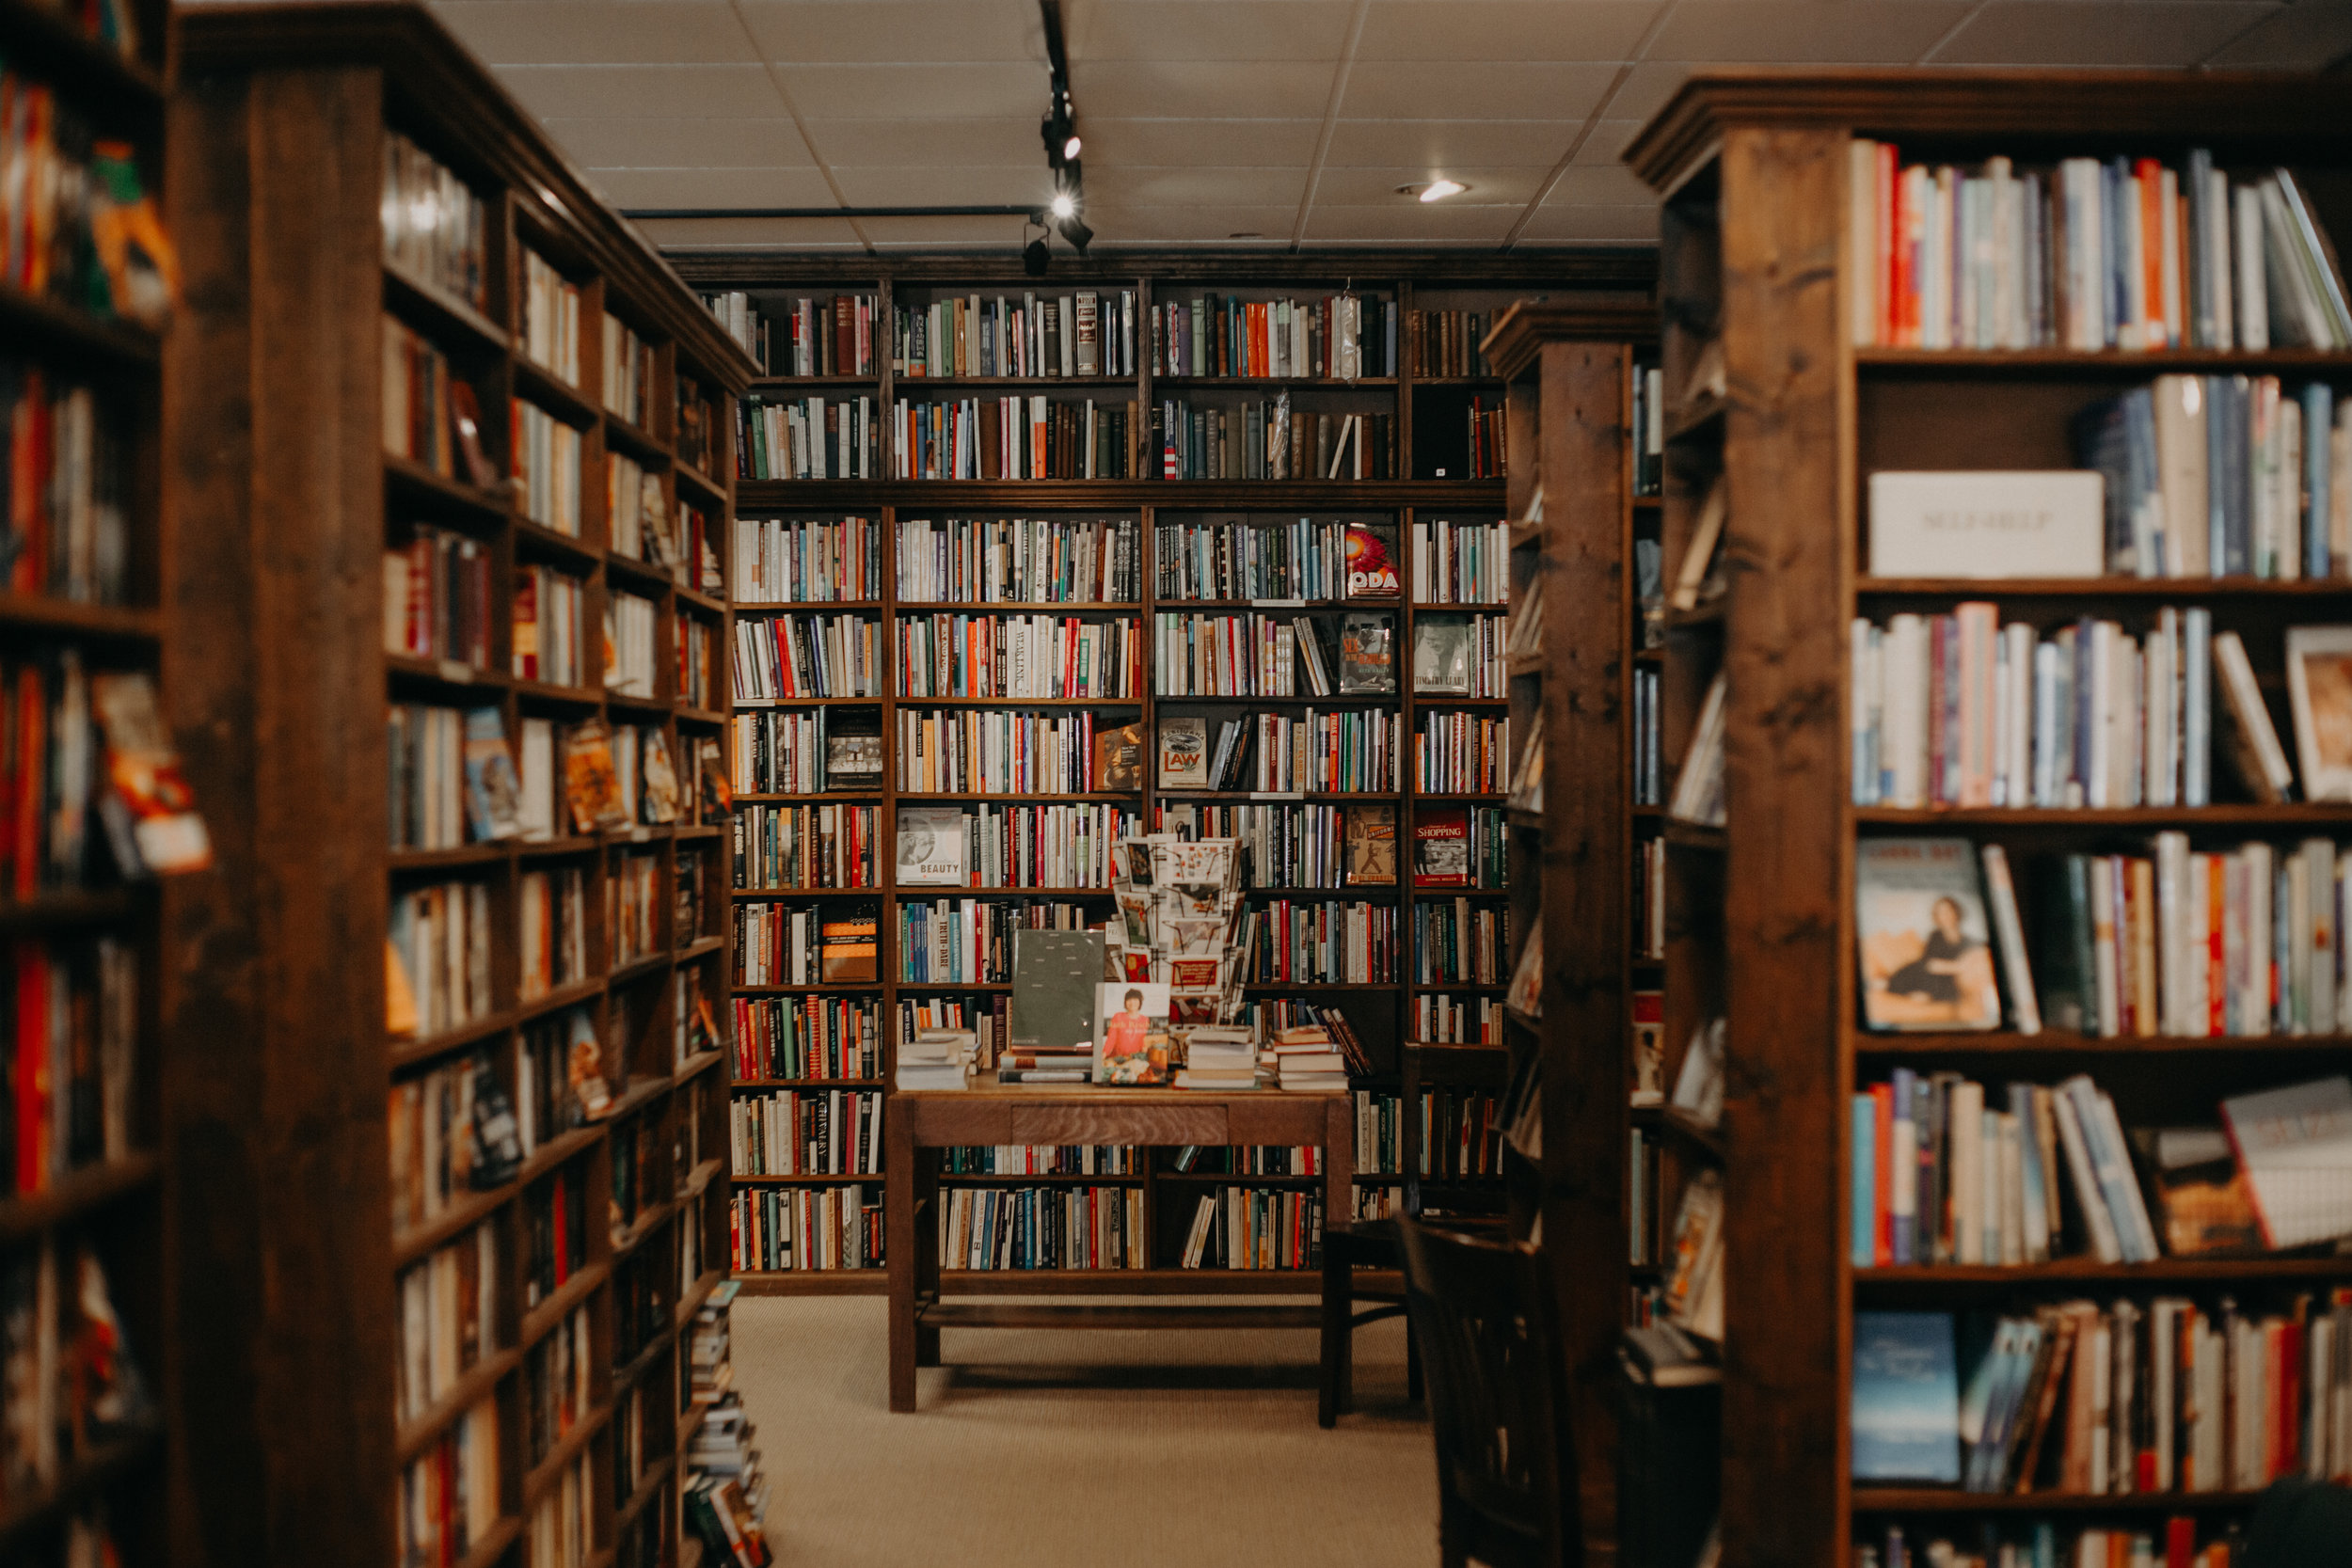 The Dusty Bookshelf